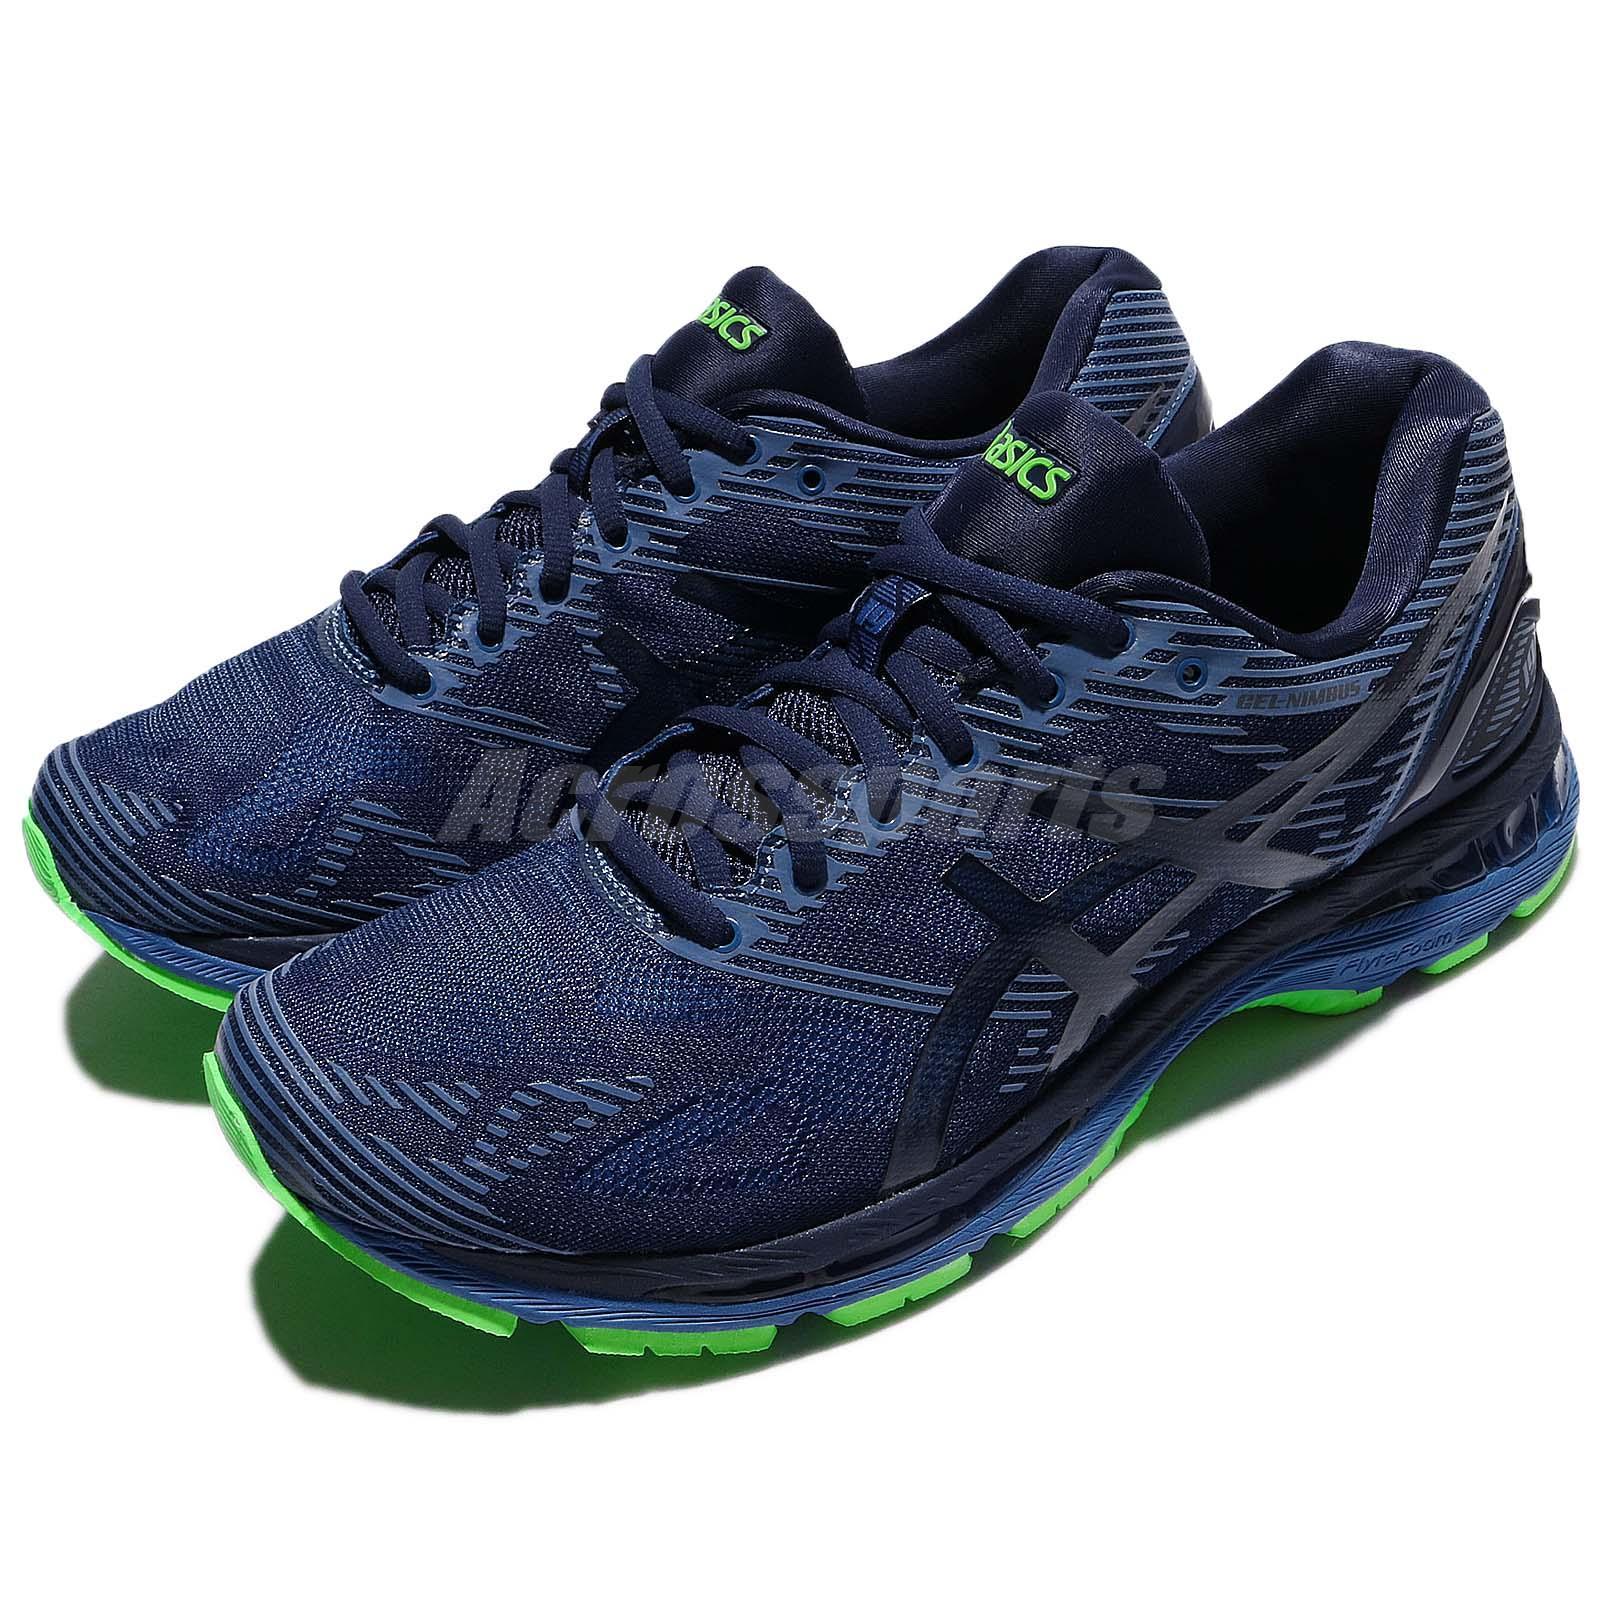 249275b8777f Details about Asics Gel-Nimbus 19 Lite-Show Xeon Indigo Blue Green Men  Running Shoe T7C3N-4943